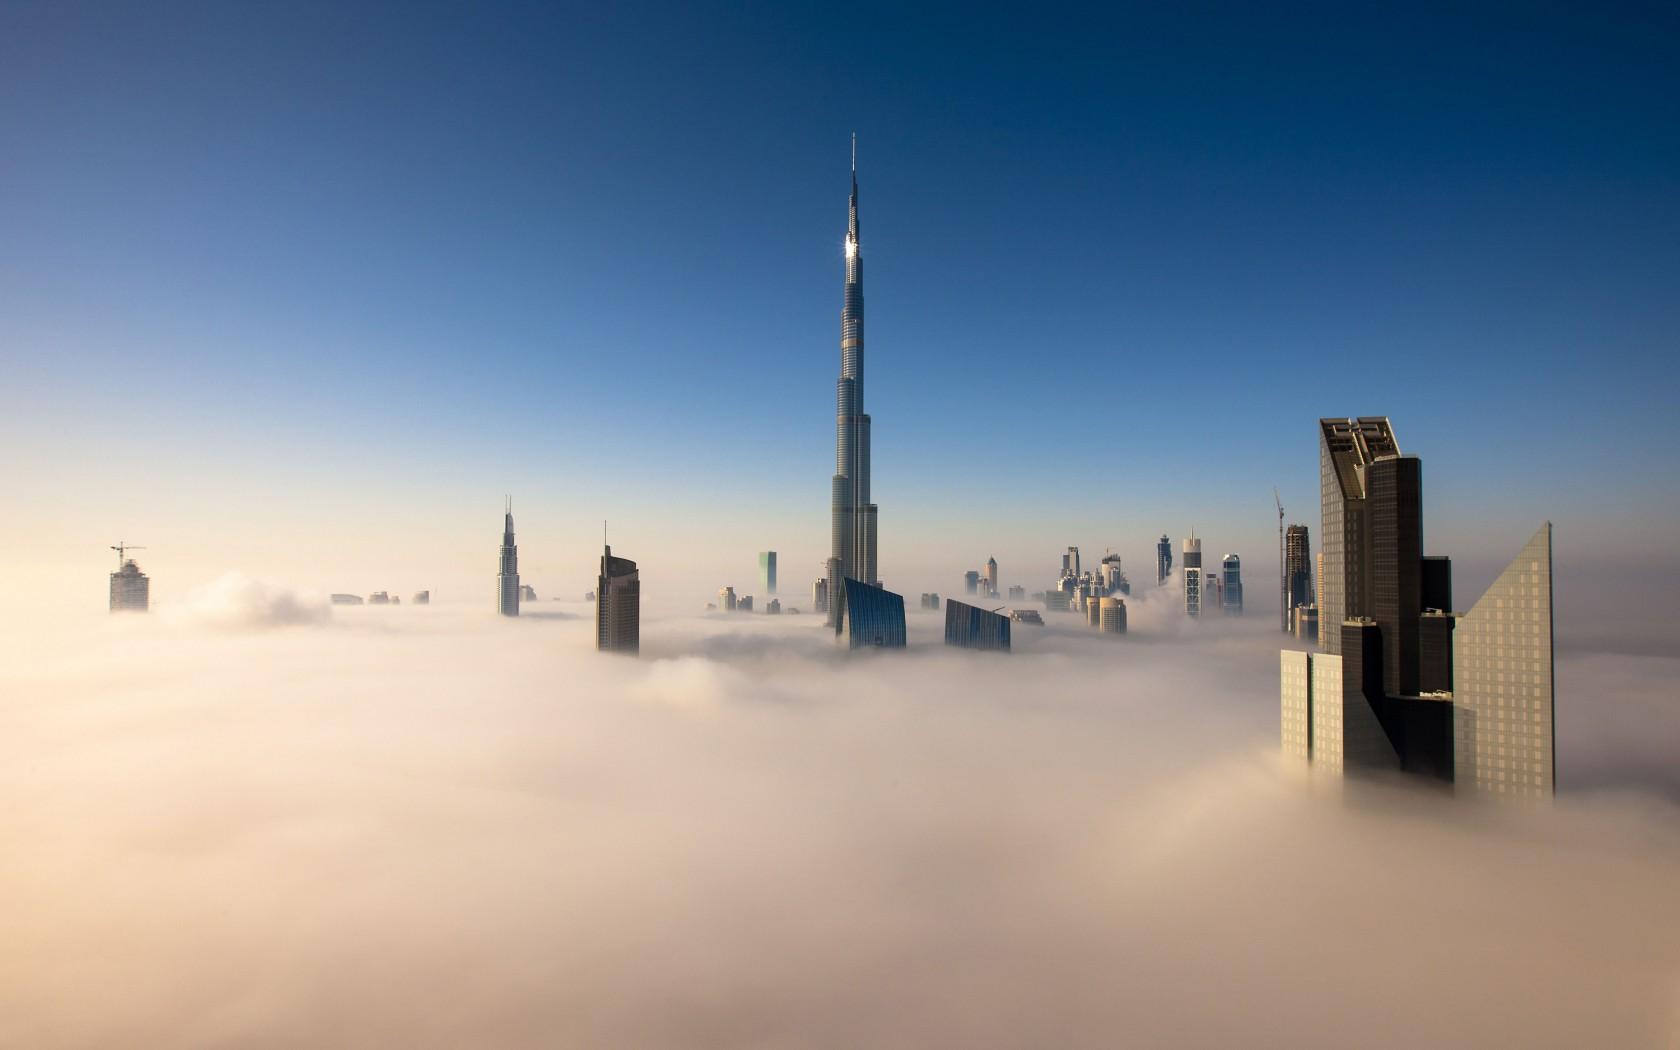 4Edited-Burj-Khalifa-rexfeatures_3606914b-1680x1050